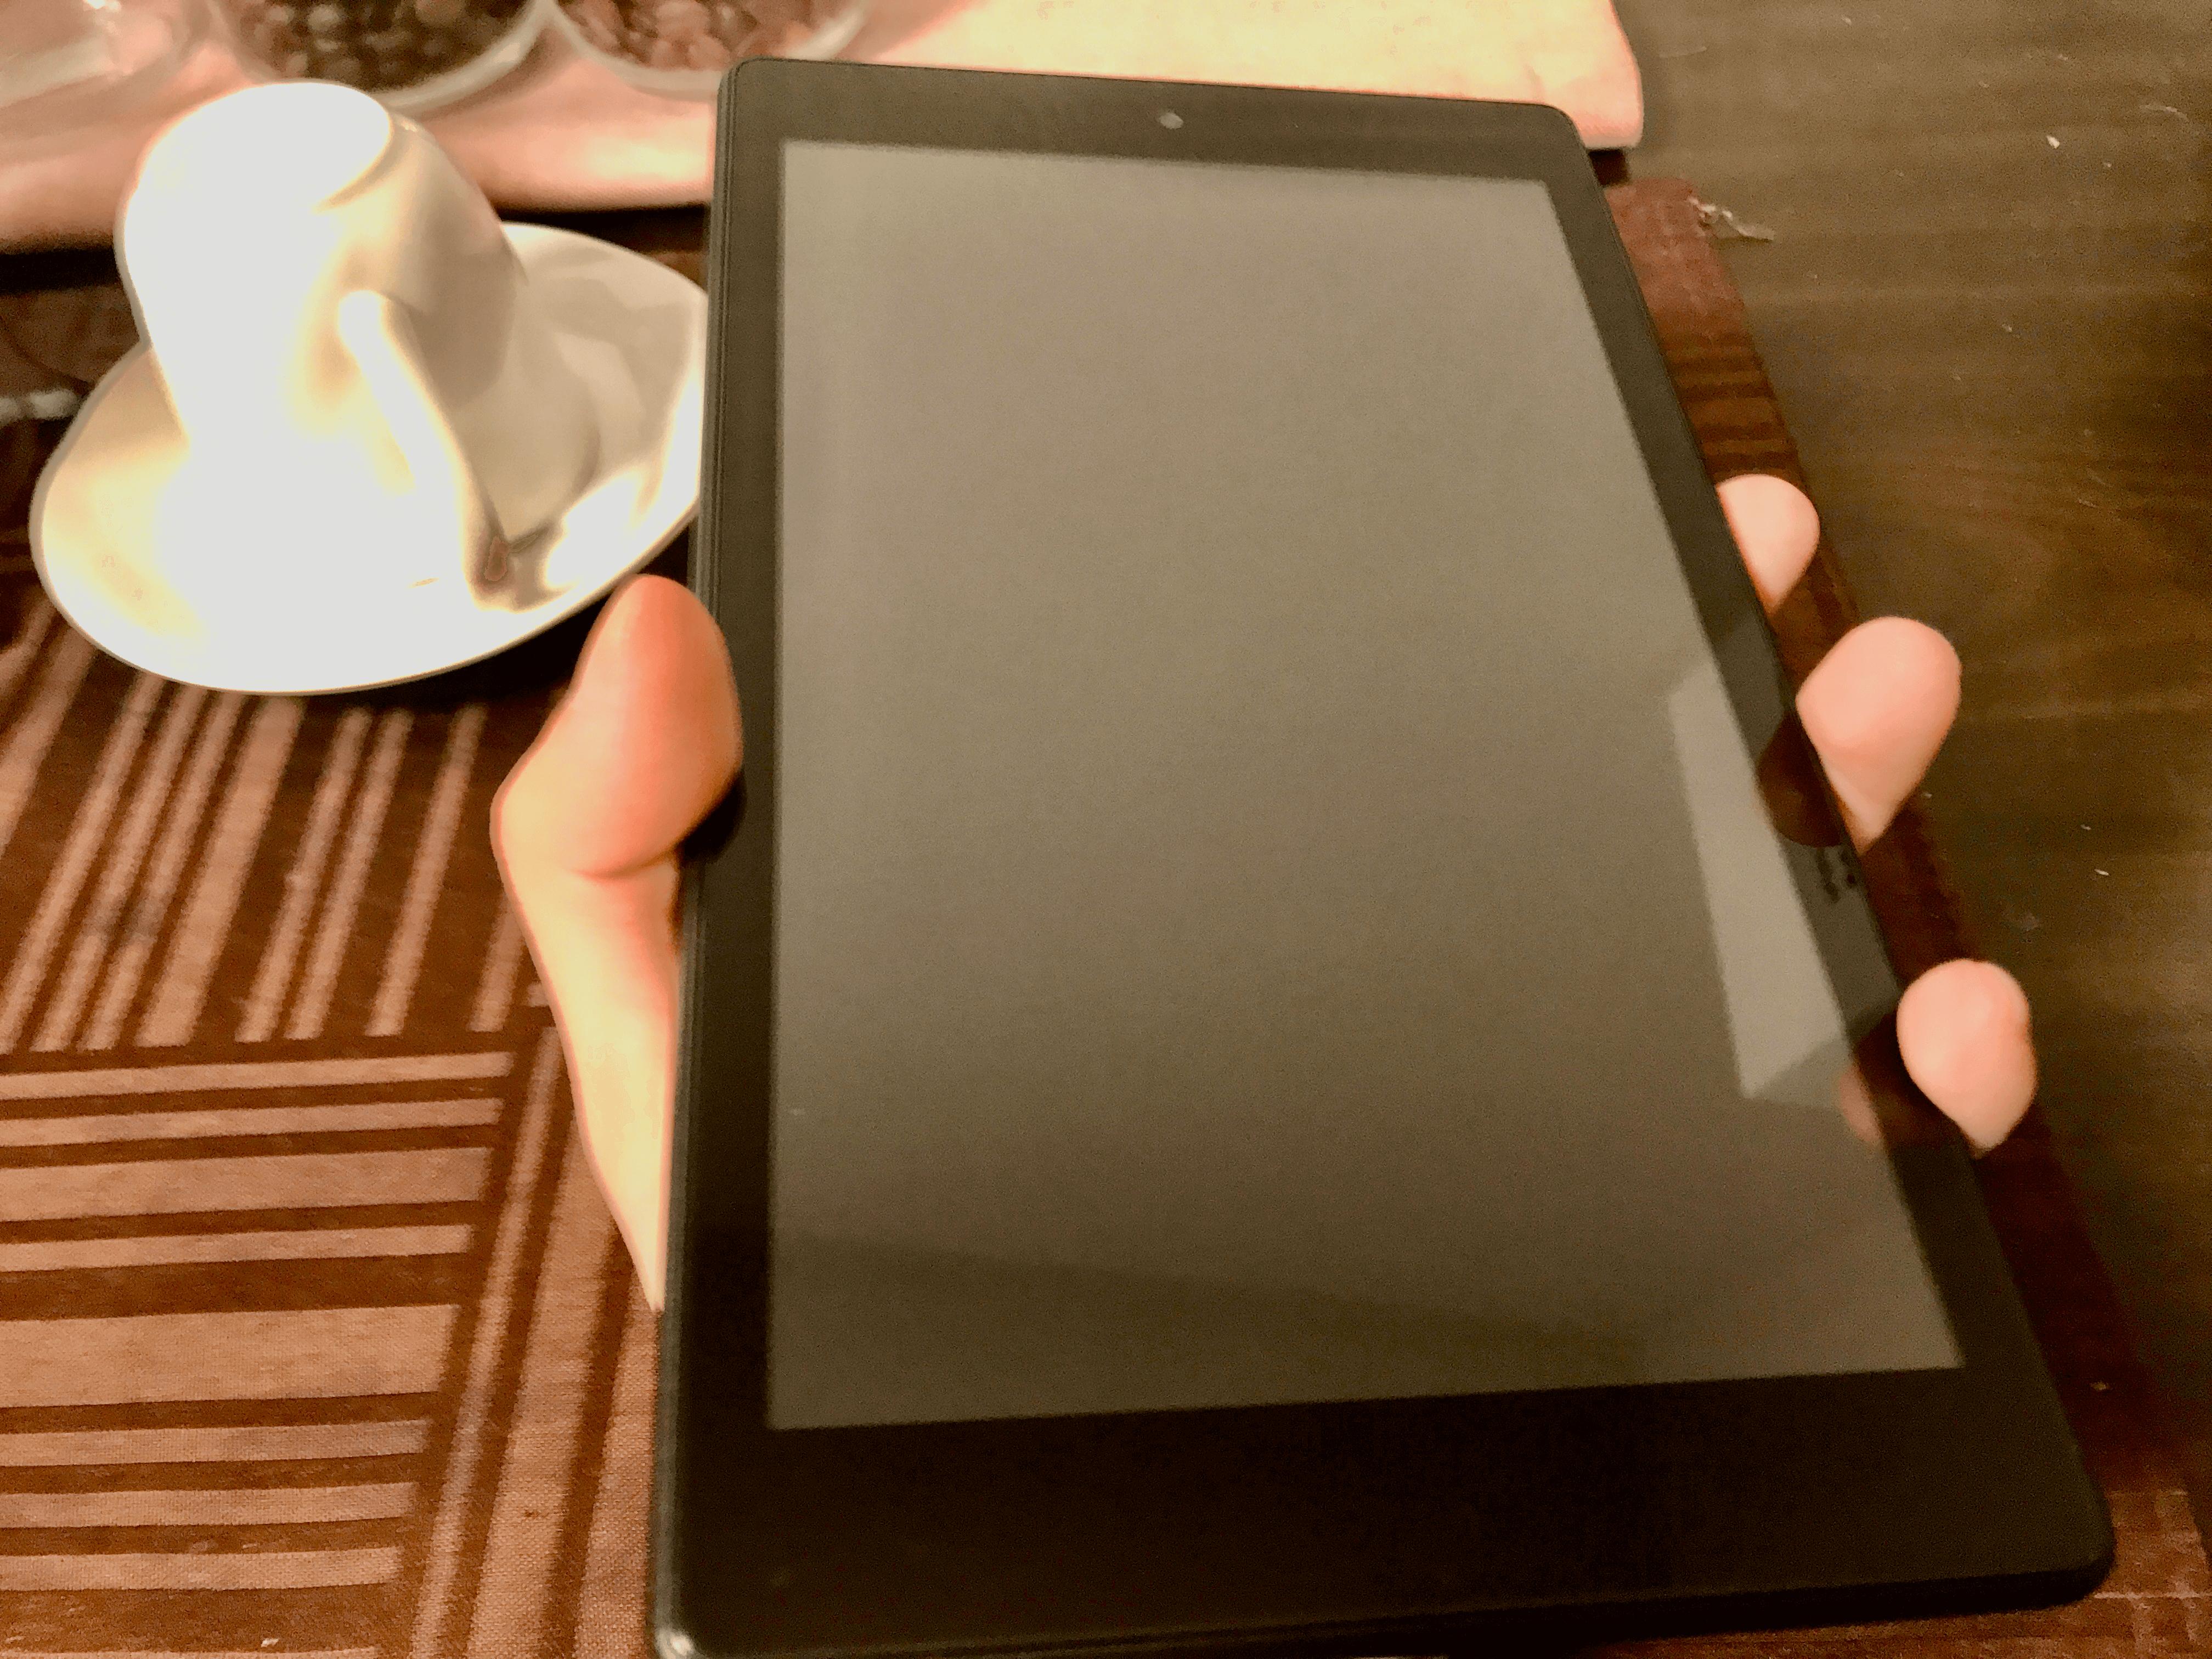 Amazonの低価格タブレットKindle Fire HD 8を買ったよ。レビューだよ。